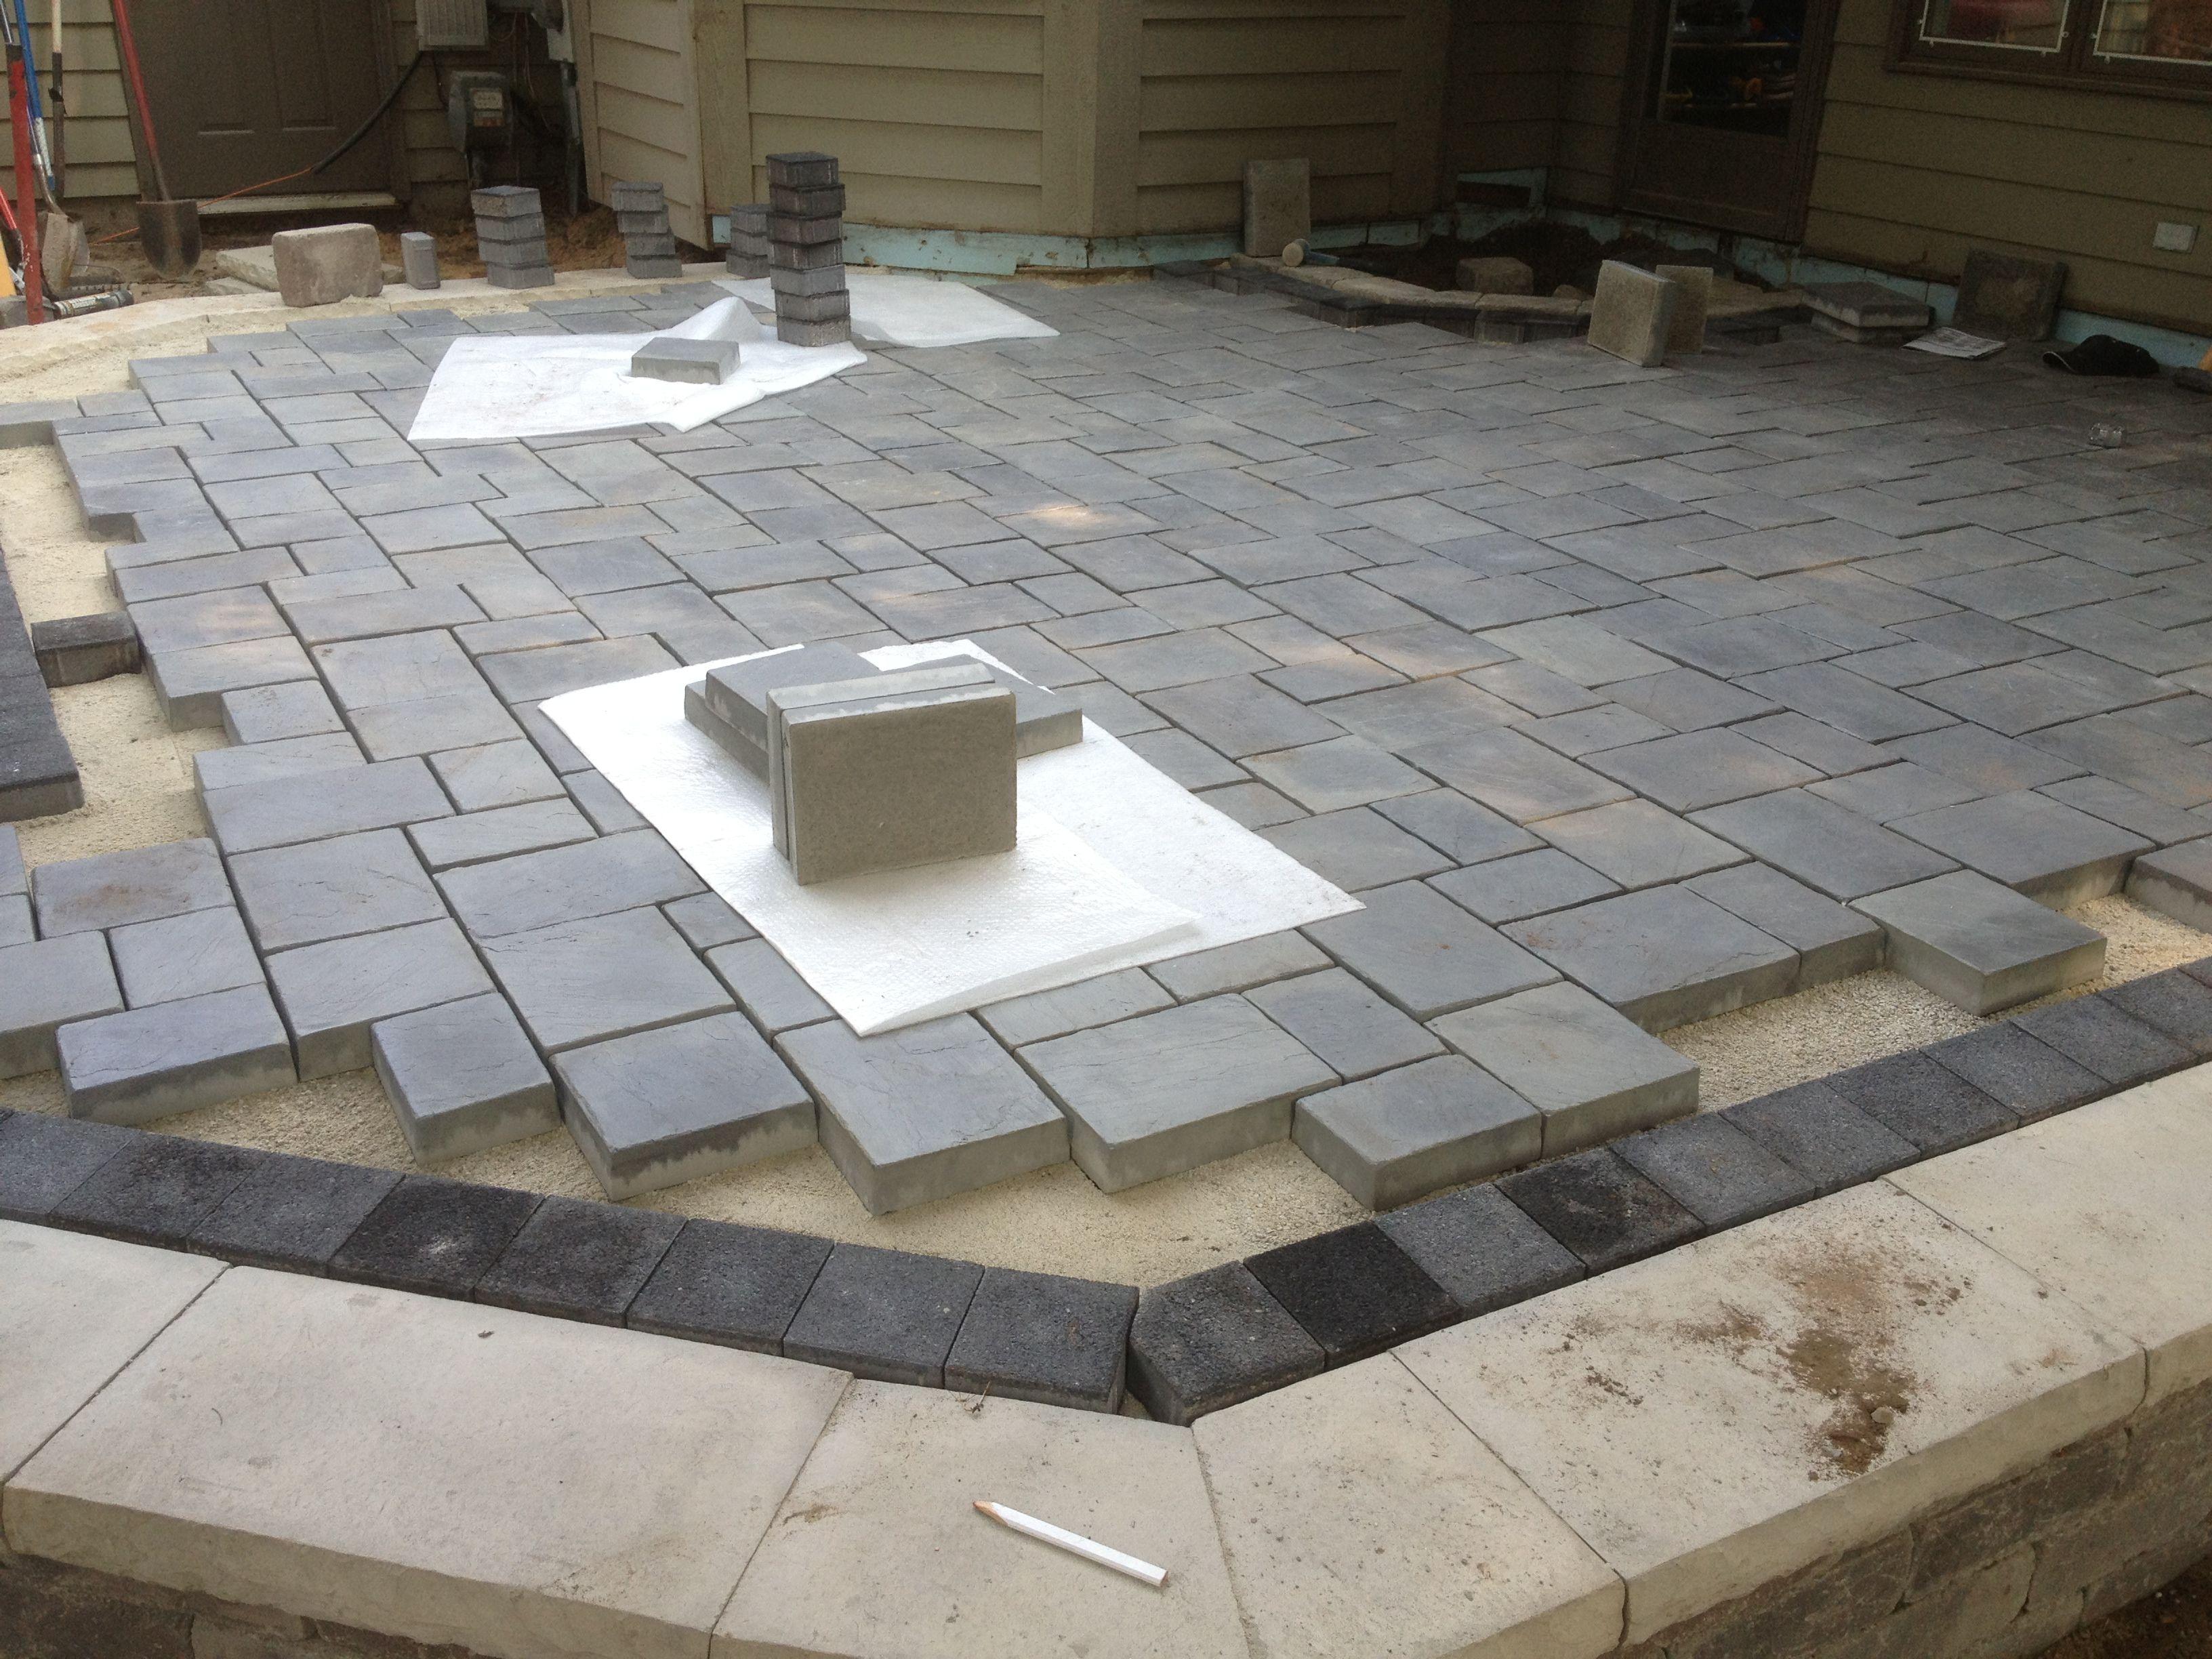 Work in progress patio using Unilock brick pavers. Stonehenge coping,  Series 3000 black accent